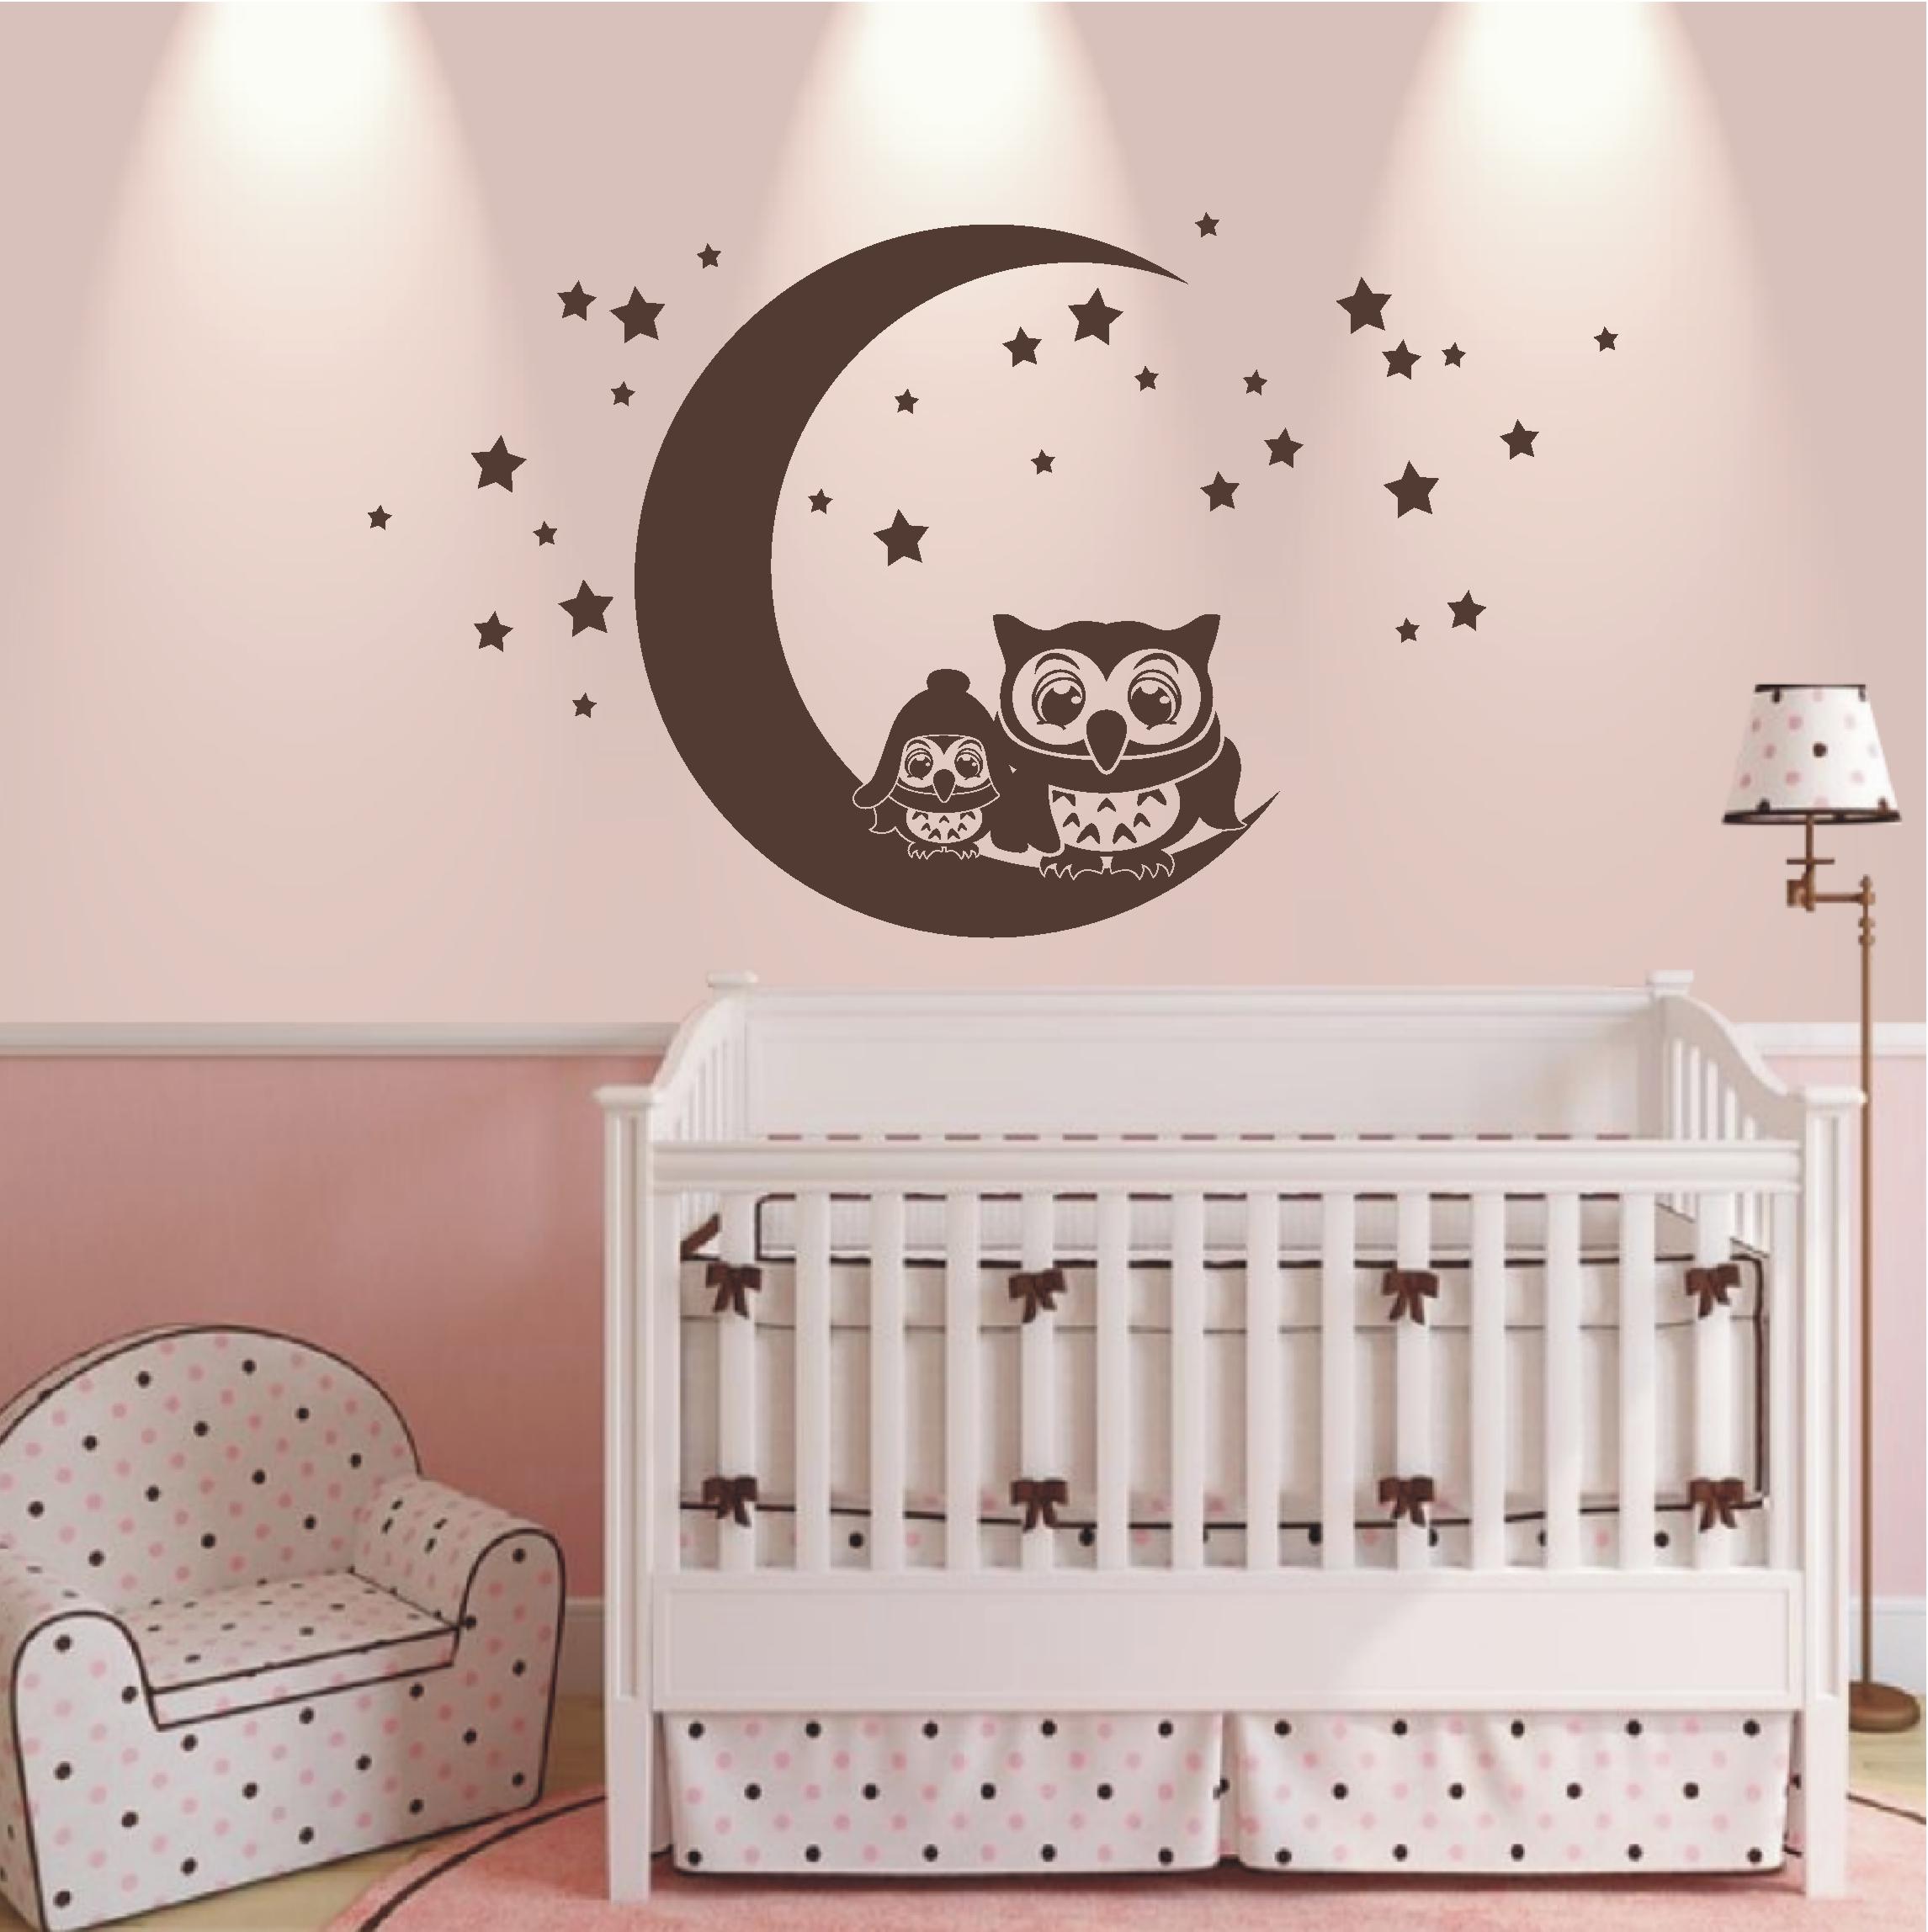 Details zu WANDTATTOO Wandaufkleber Eulen Mond Sterne Wandaufkleber  Kinderzimmer Baby 542